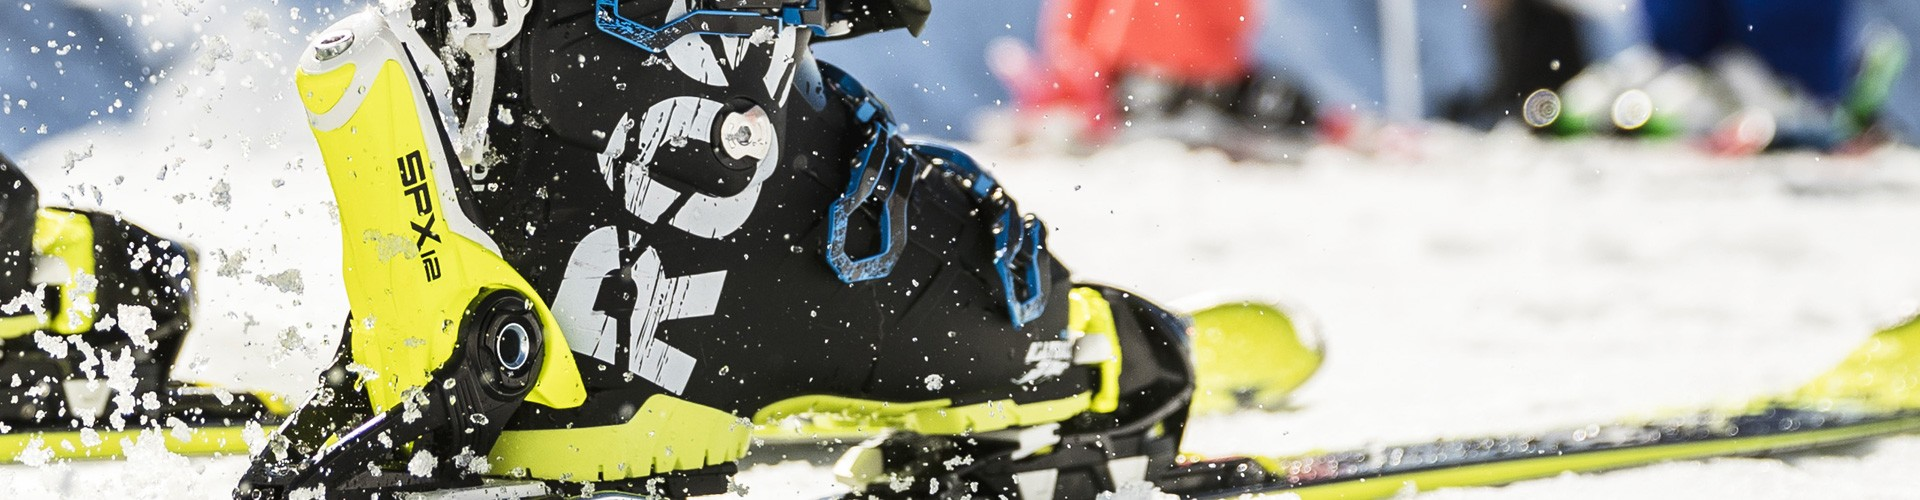 rossignol-alpine-skiboots